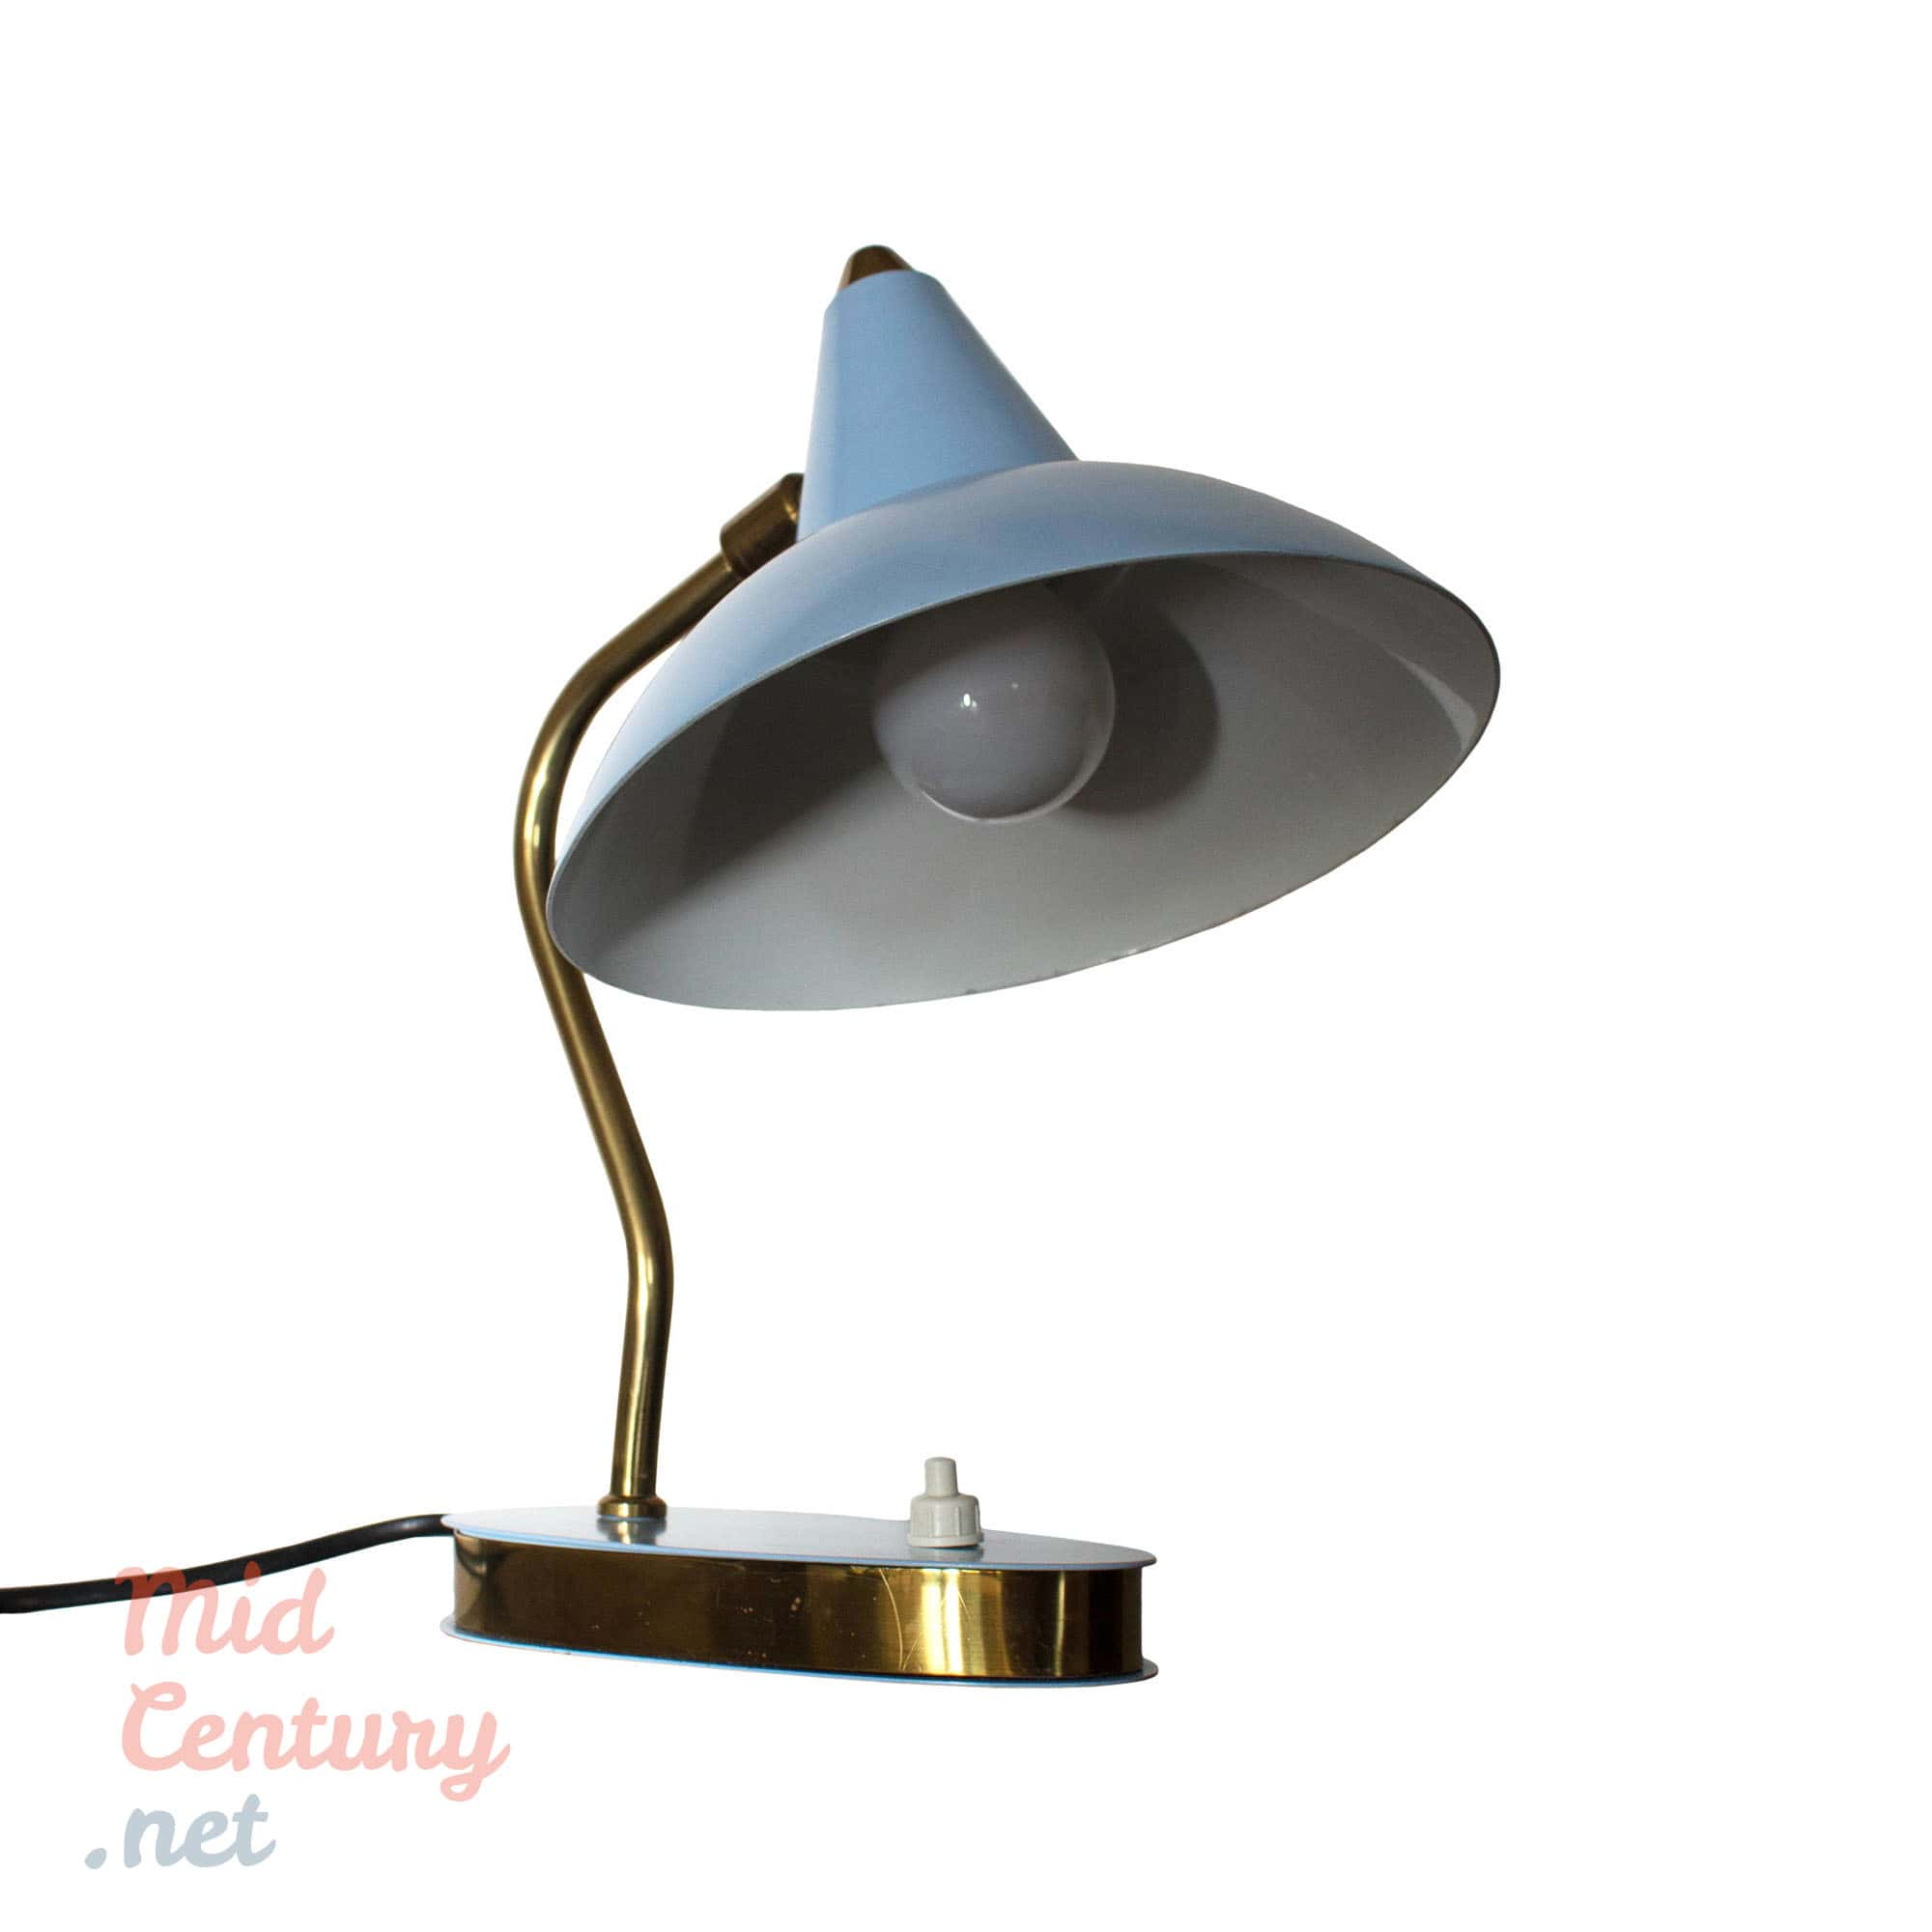 Charming Mid-Century table lamp